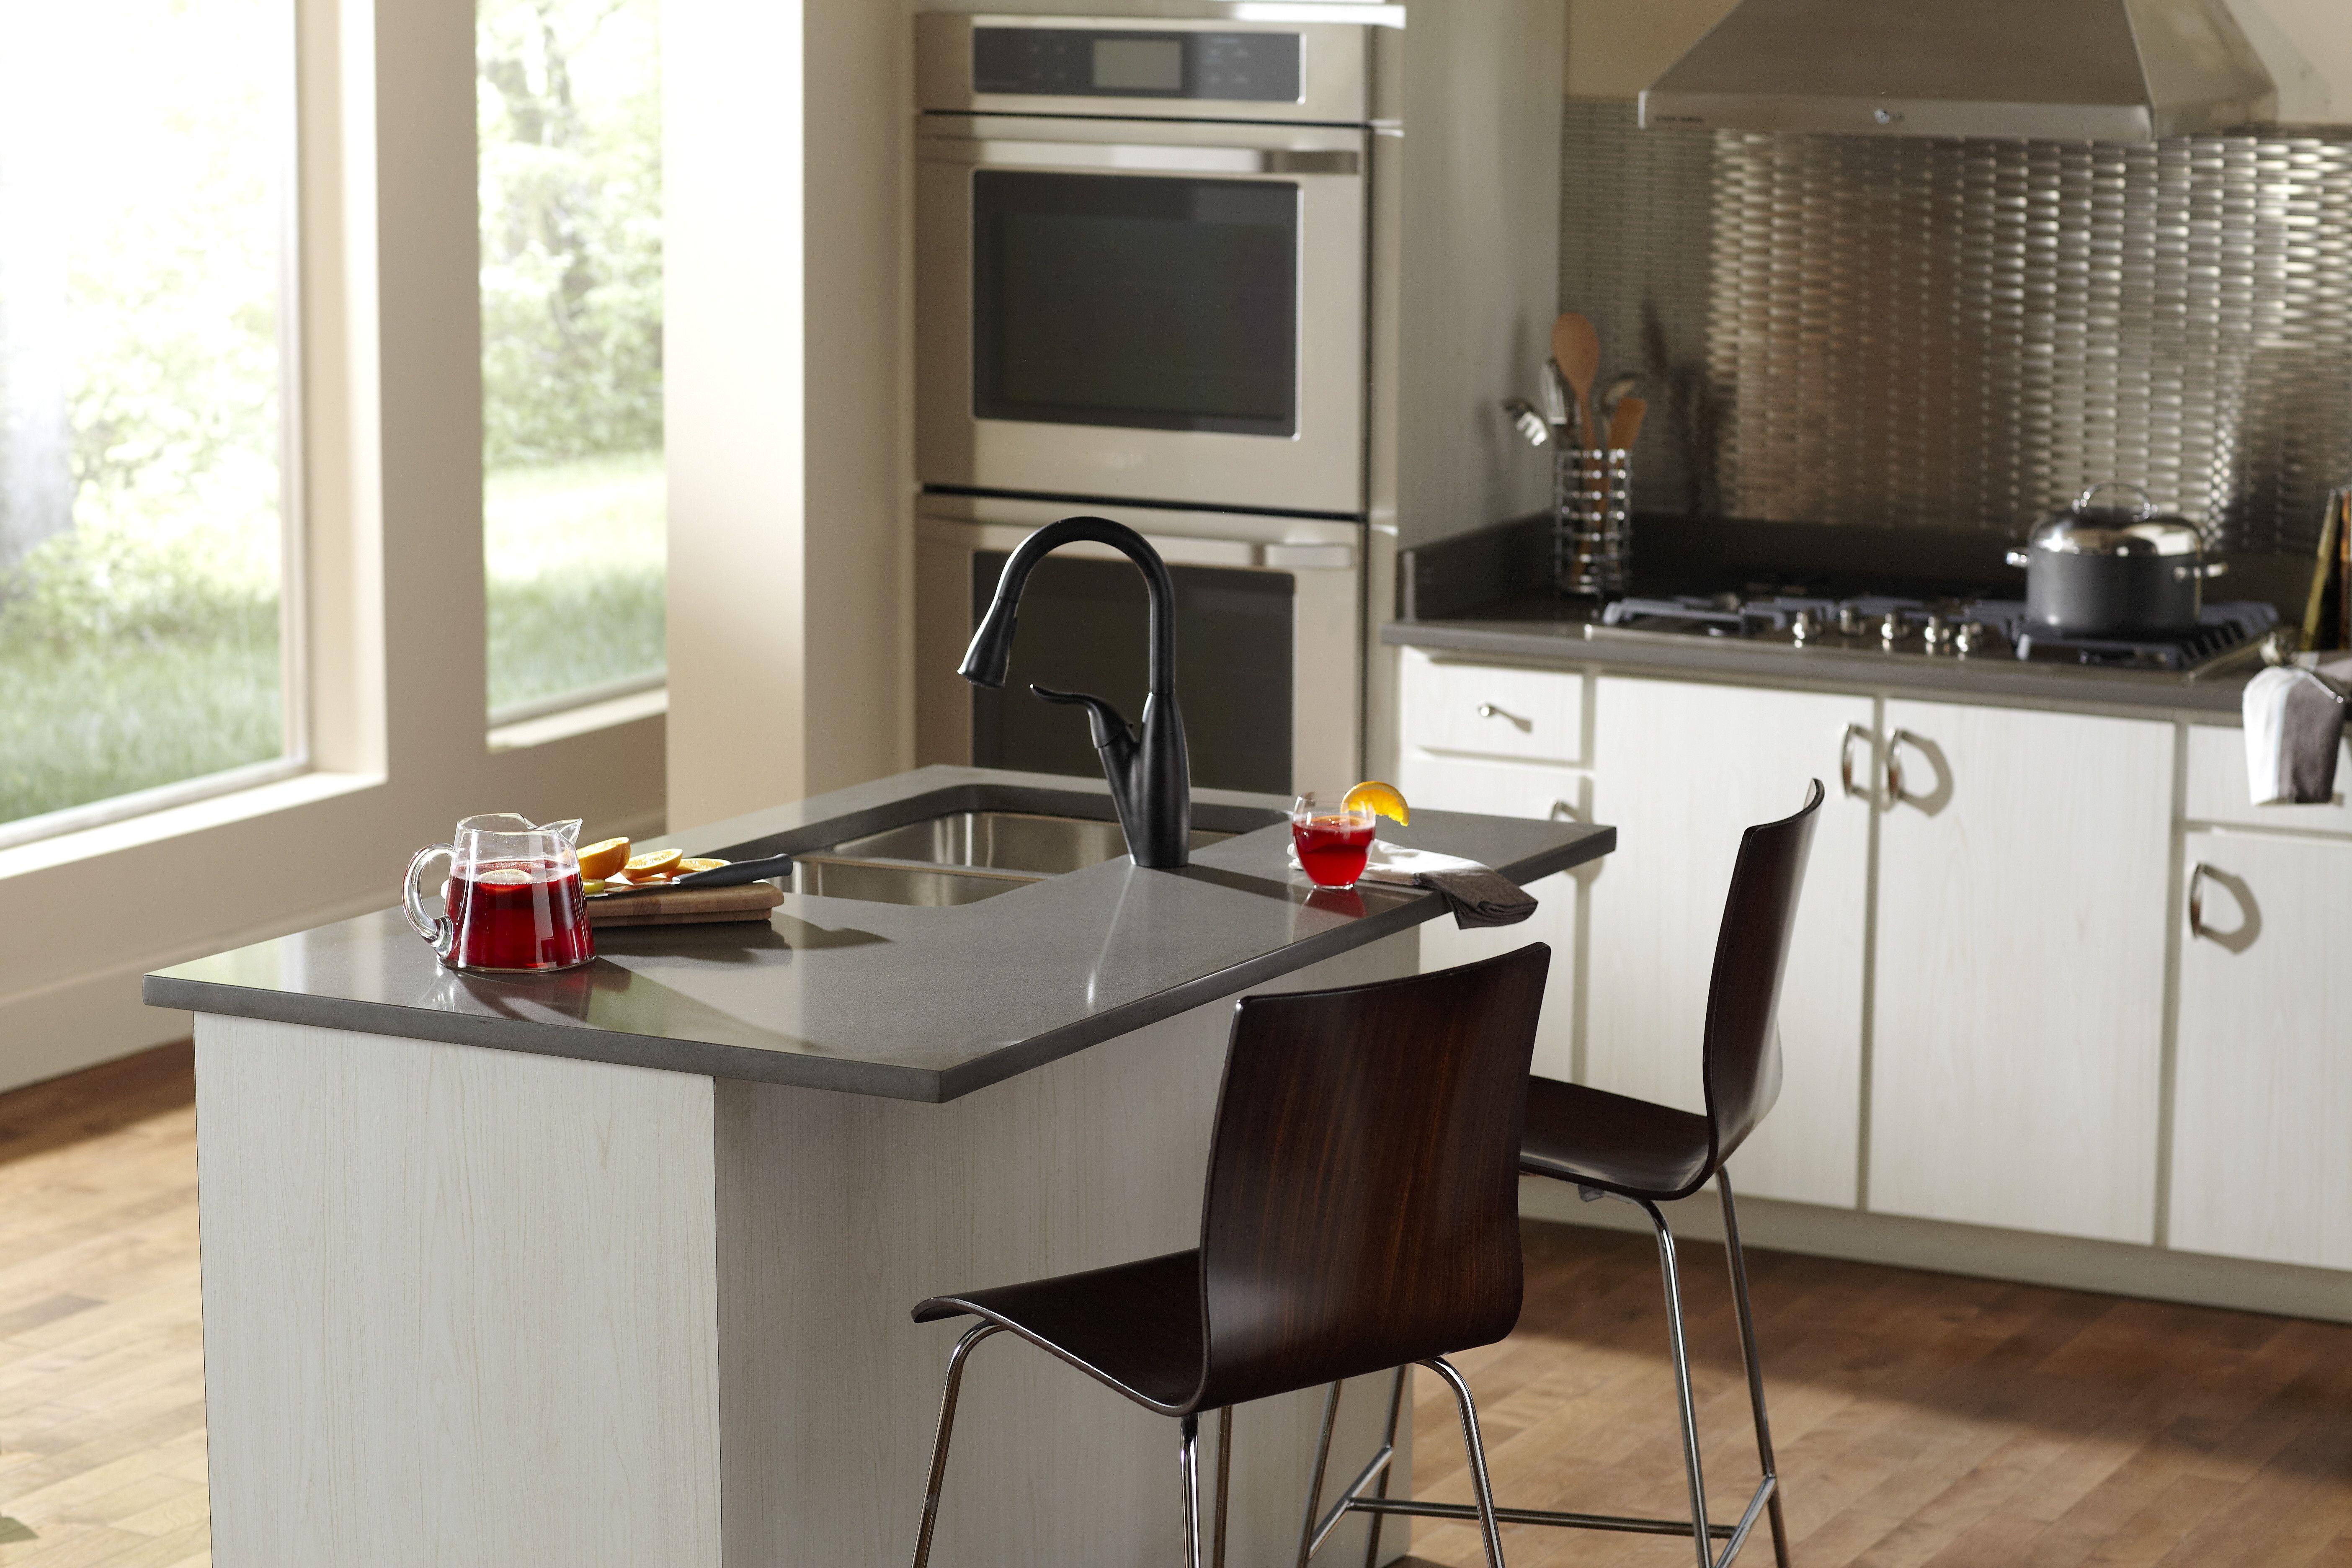 Silestone ALTAIR | Kitchen Silestone by Cosentino | Pinterest